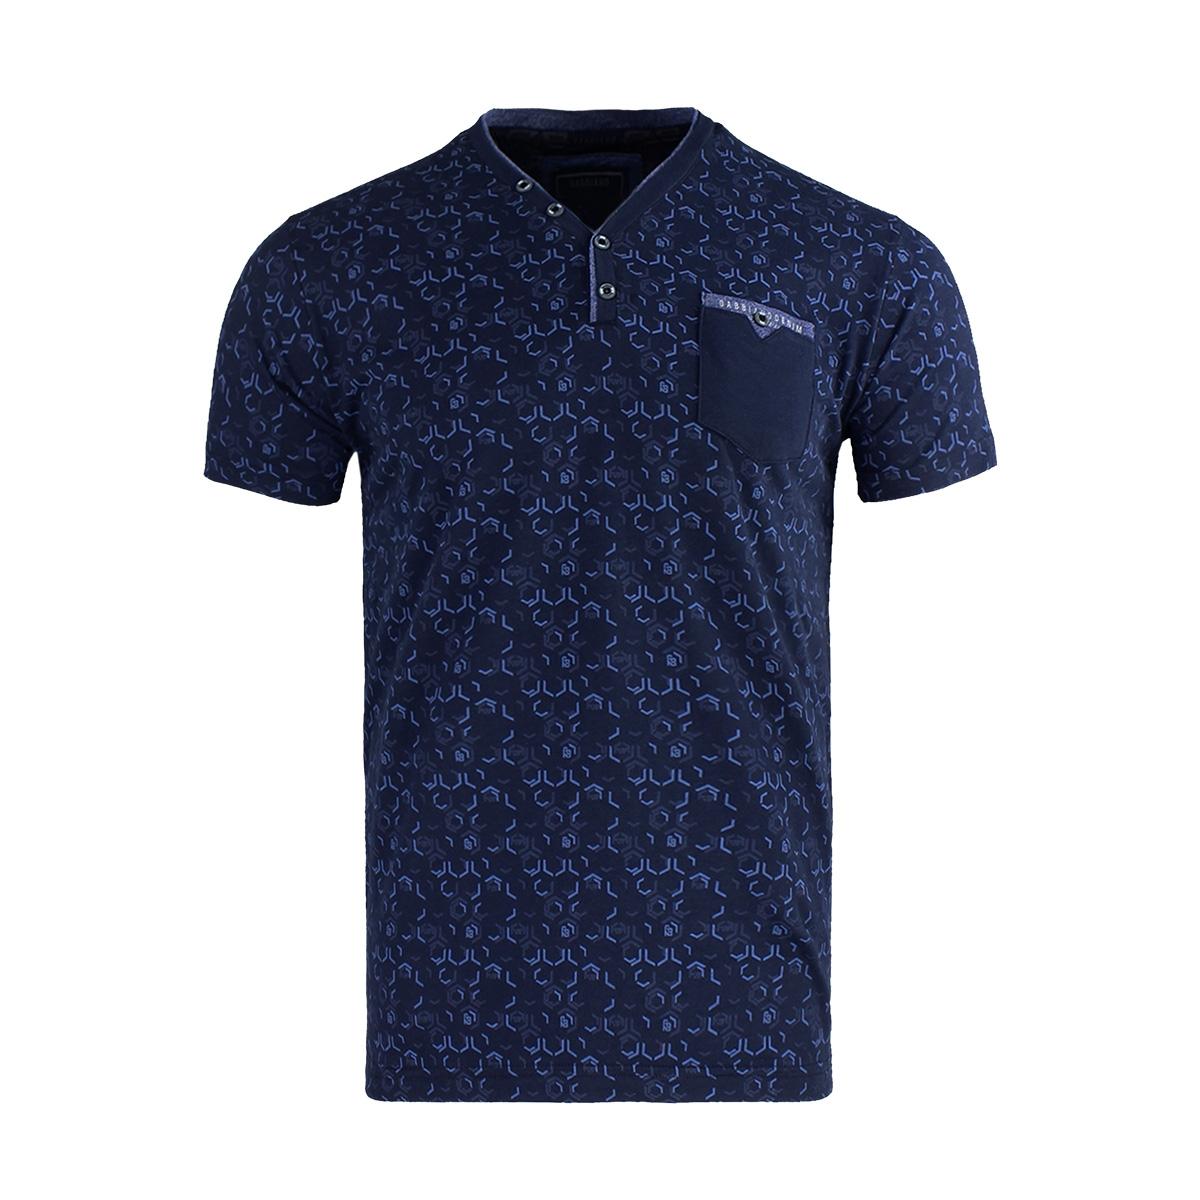 t shirt shortsleeve 15132 gabbiano t-shirt navy